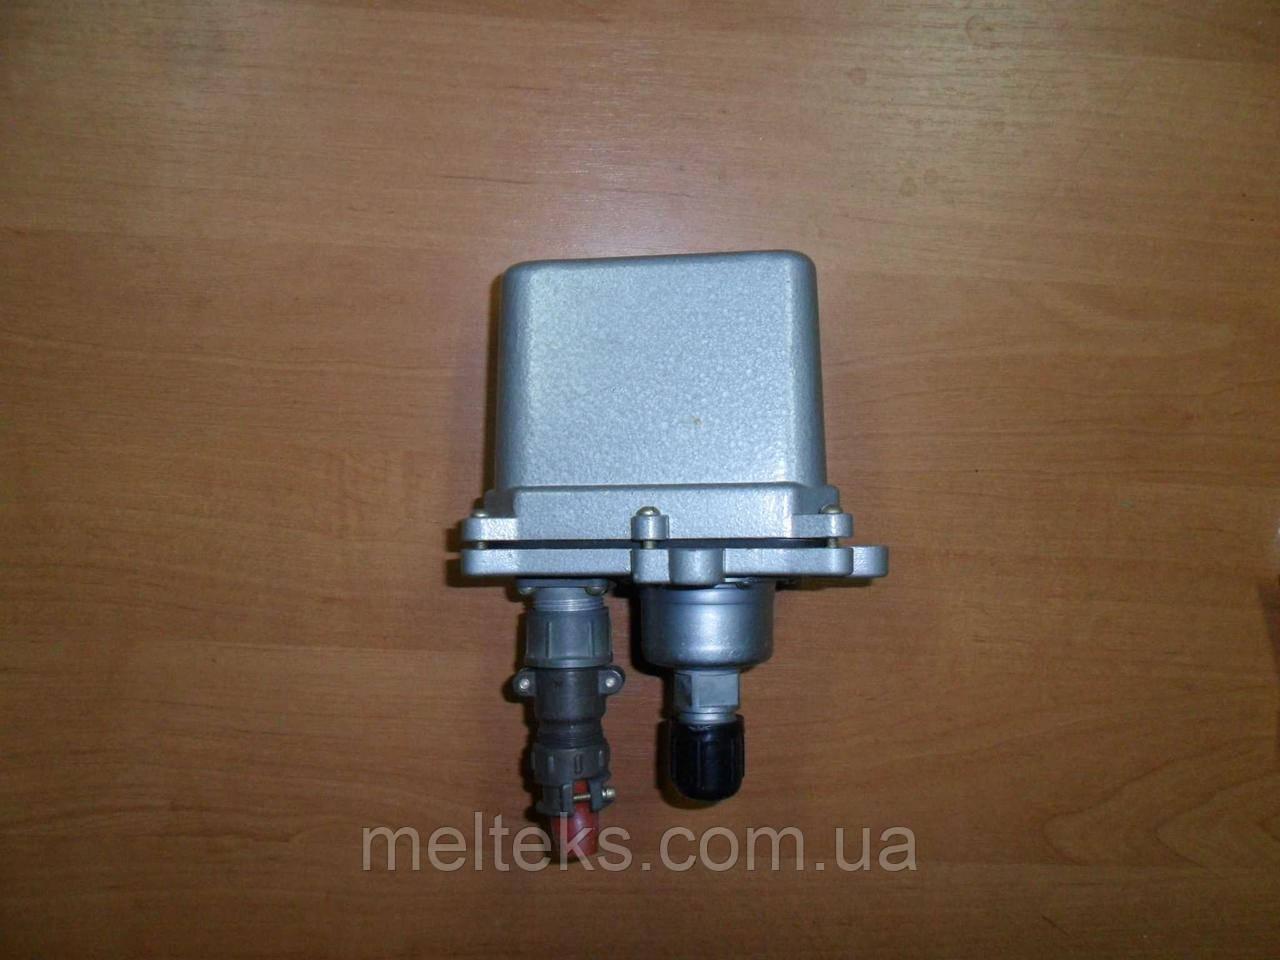 Реле вакуума РВК-1Т аналог ДЕМ 118